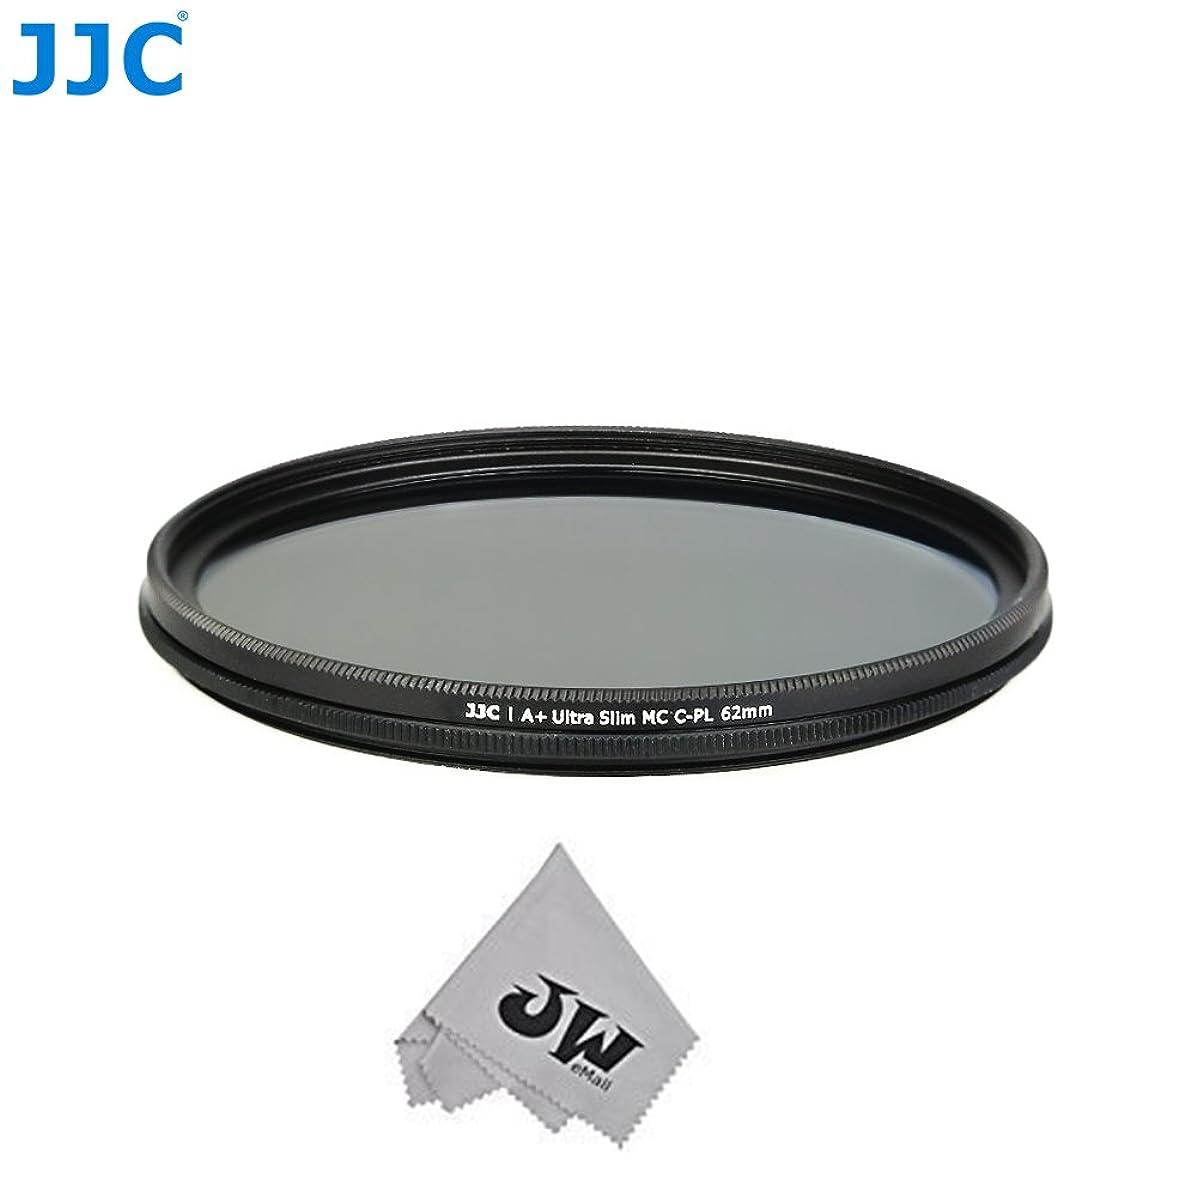 JW 72mm CPL Circular Polarizer Filter For Canon EF 50mm f/1.2L USM,135mm f/2L USM,85mm f/1.2 L II USM,EF-S 15-85mm ,18-200mm f/3.5-5.6 IS Tamron SP AF 17-50mm B005+JW Cloth